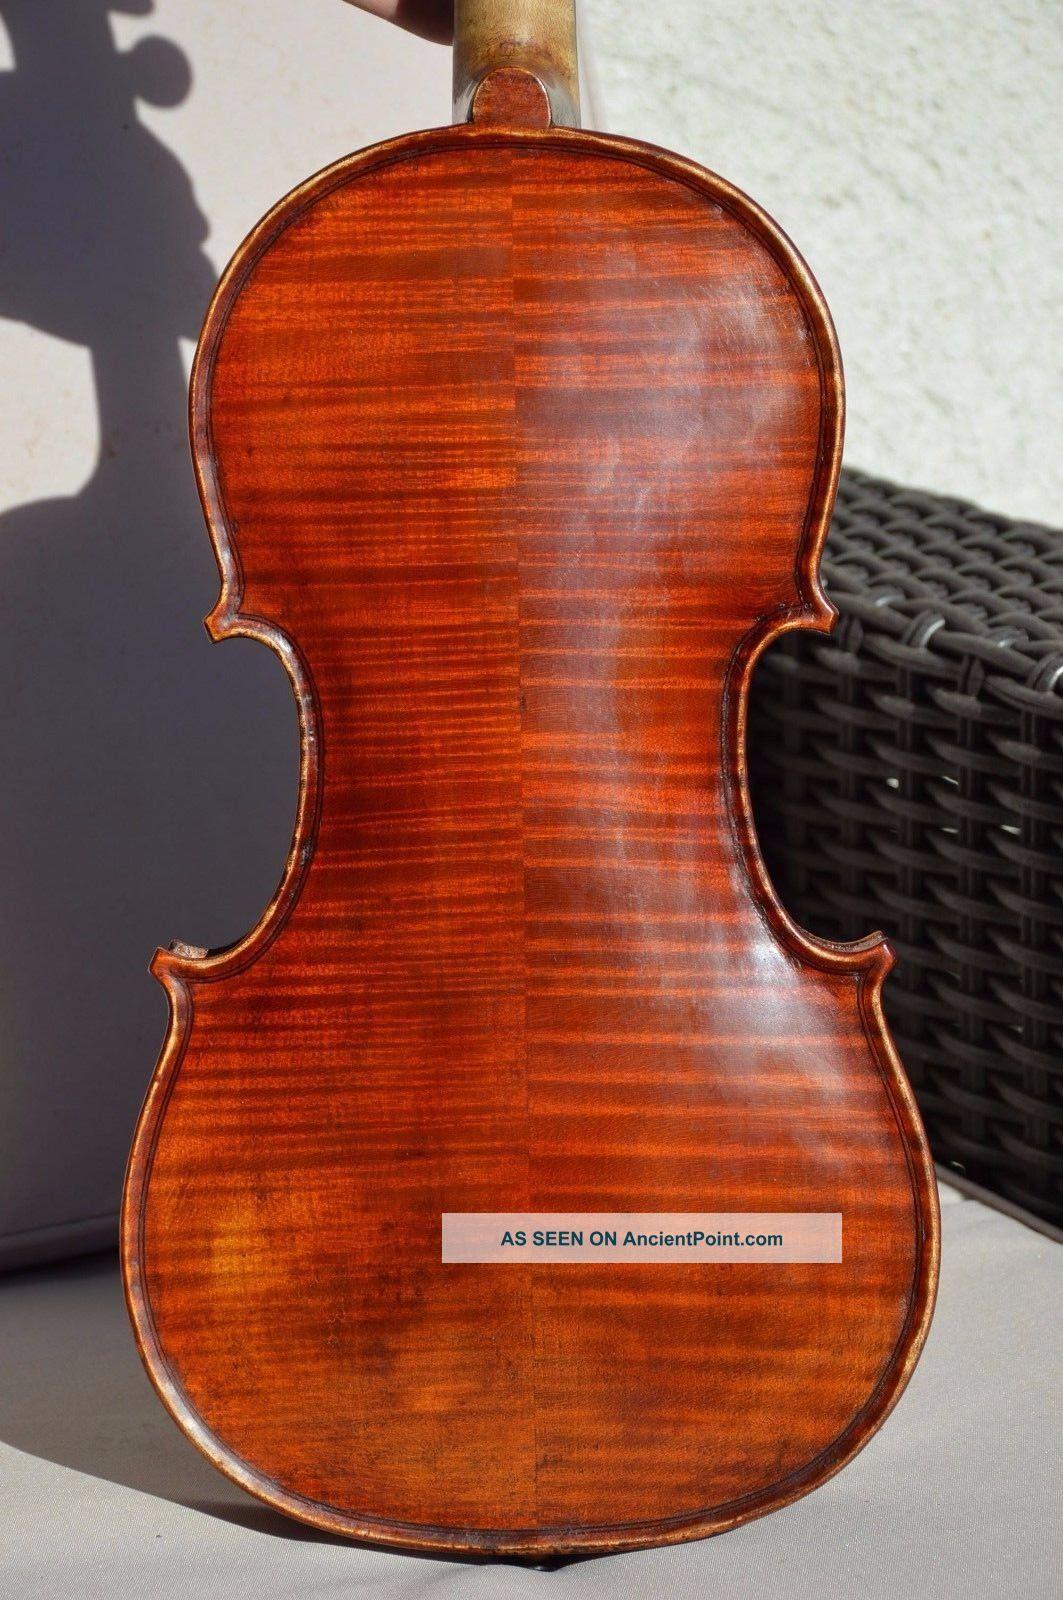 Lvgdvnvm Lugdunum 1933 Old French Violin String photo